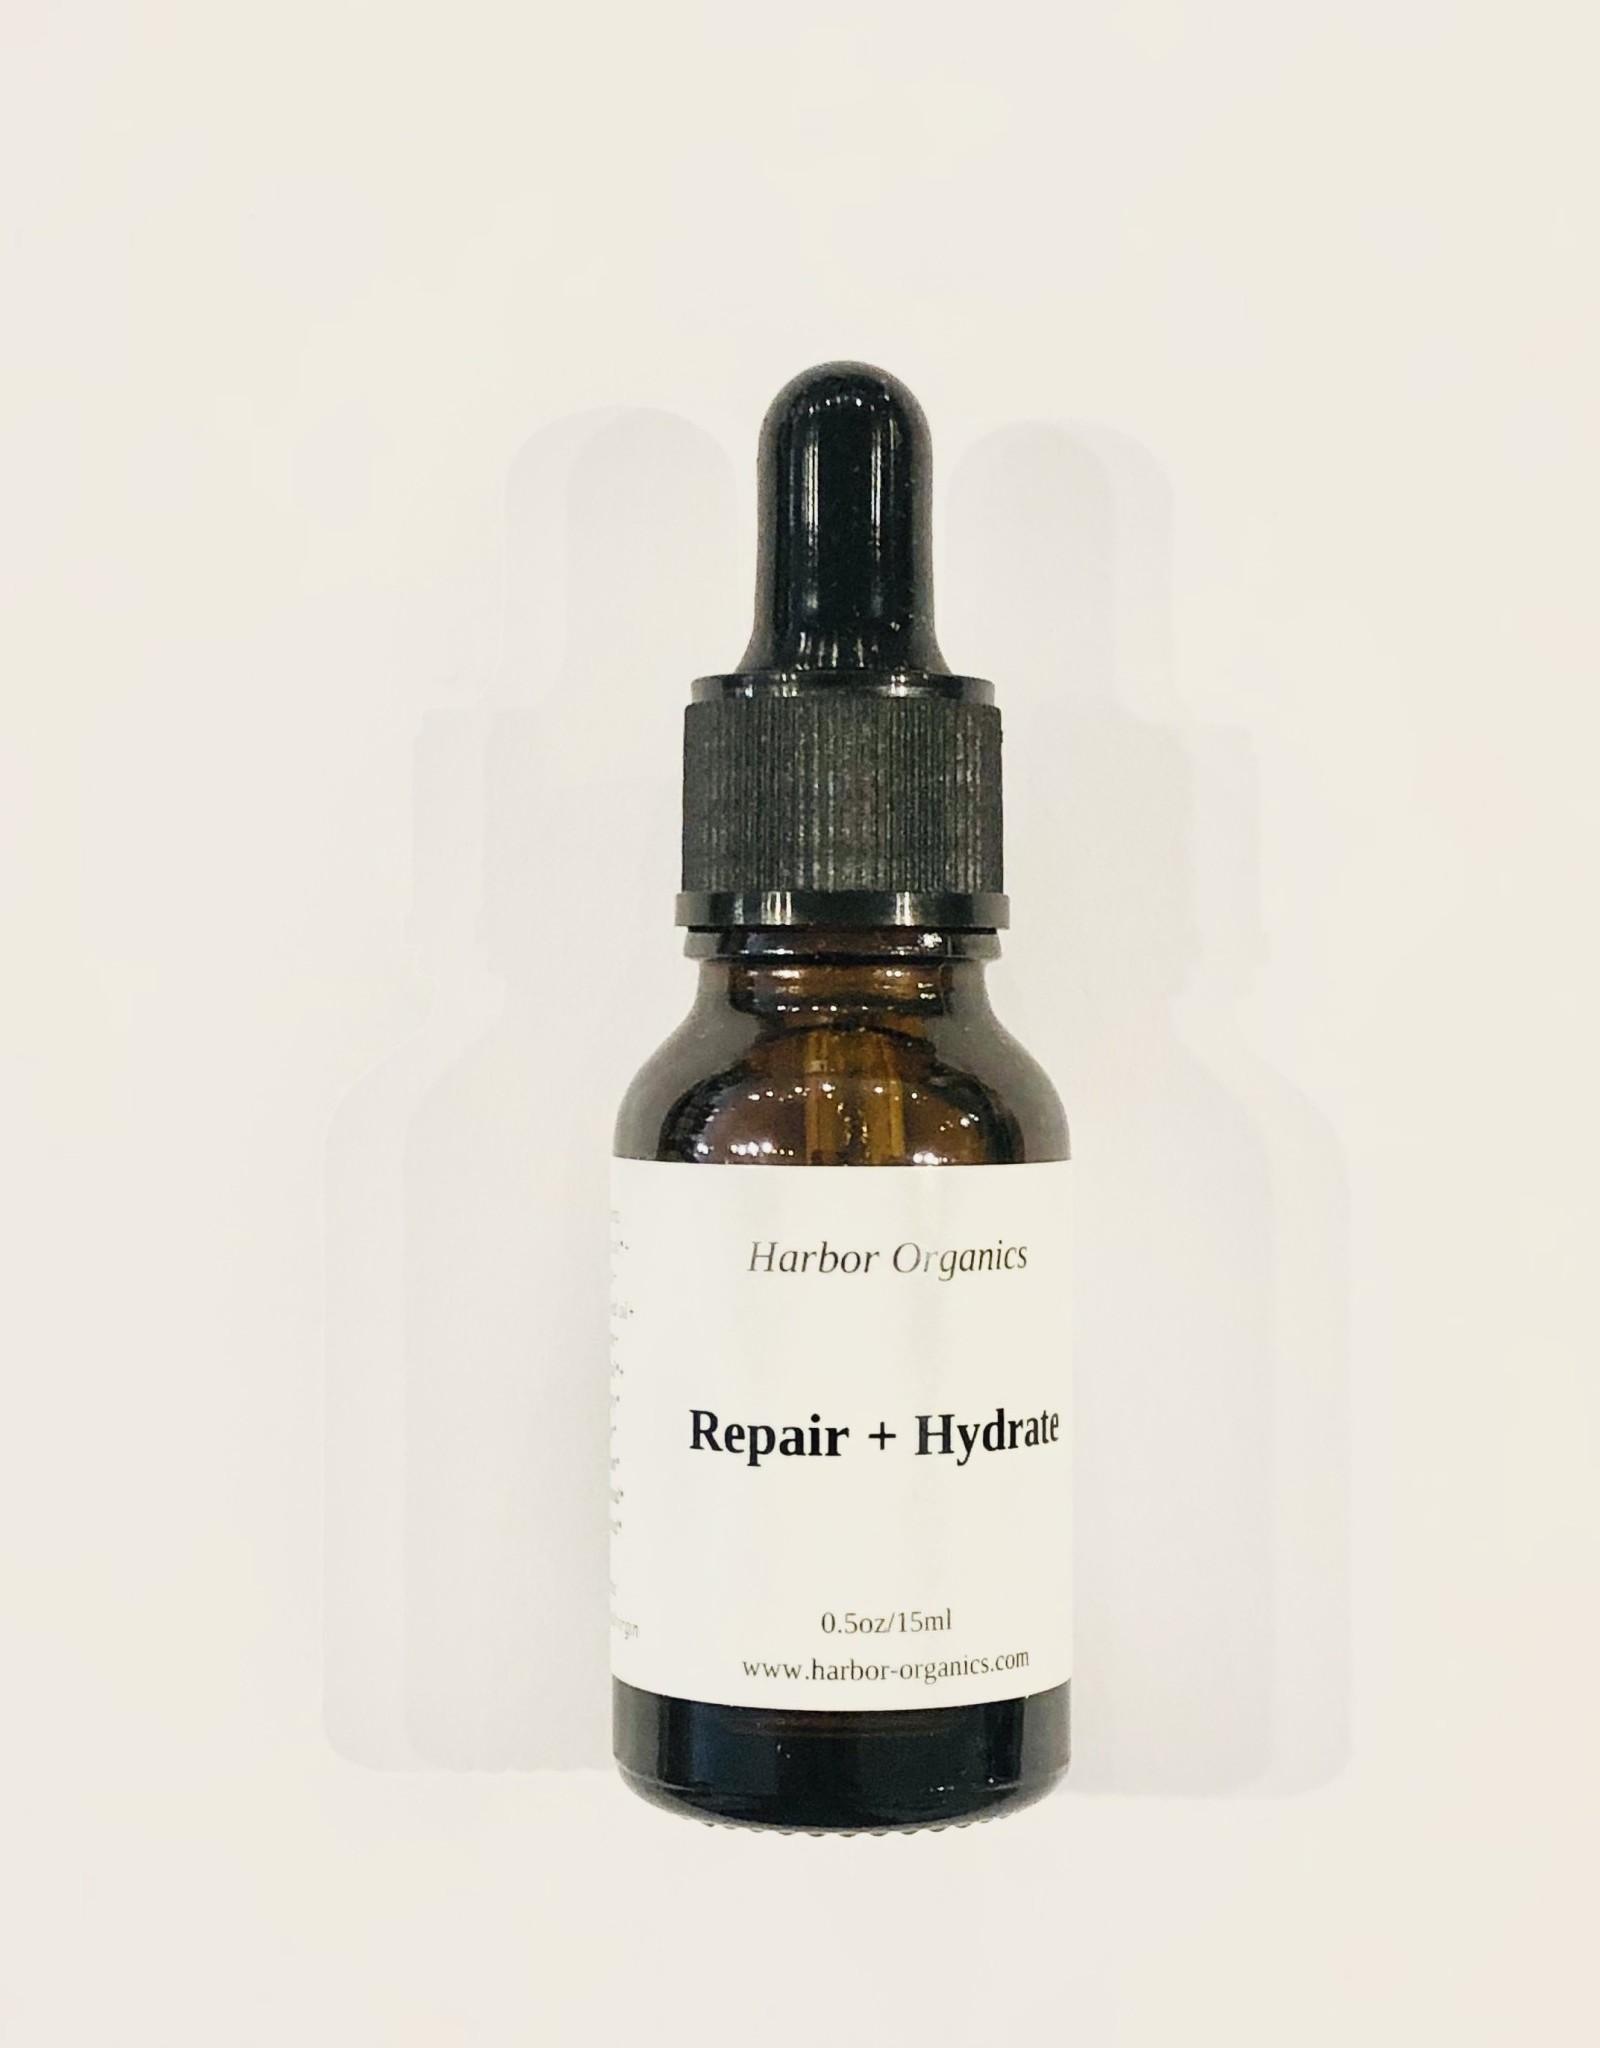 Scandic Botanica .5 oz. Repair + Hydrate